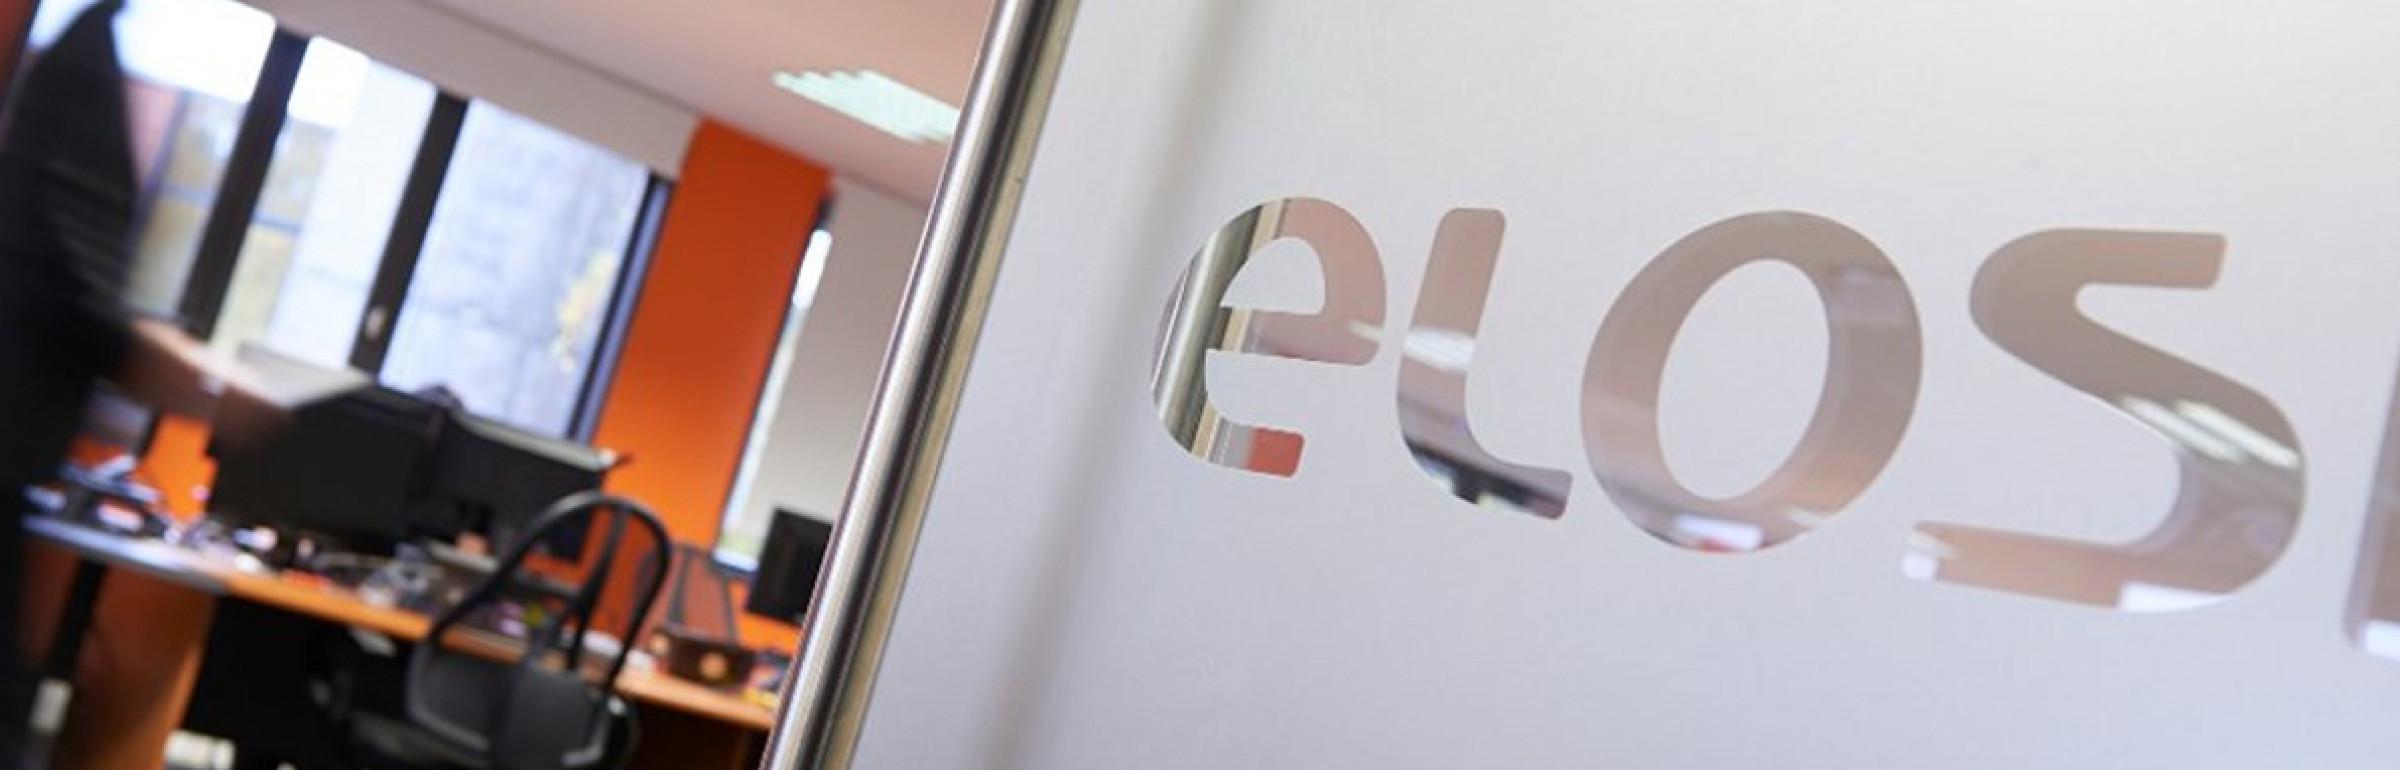 Banner Elosi